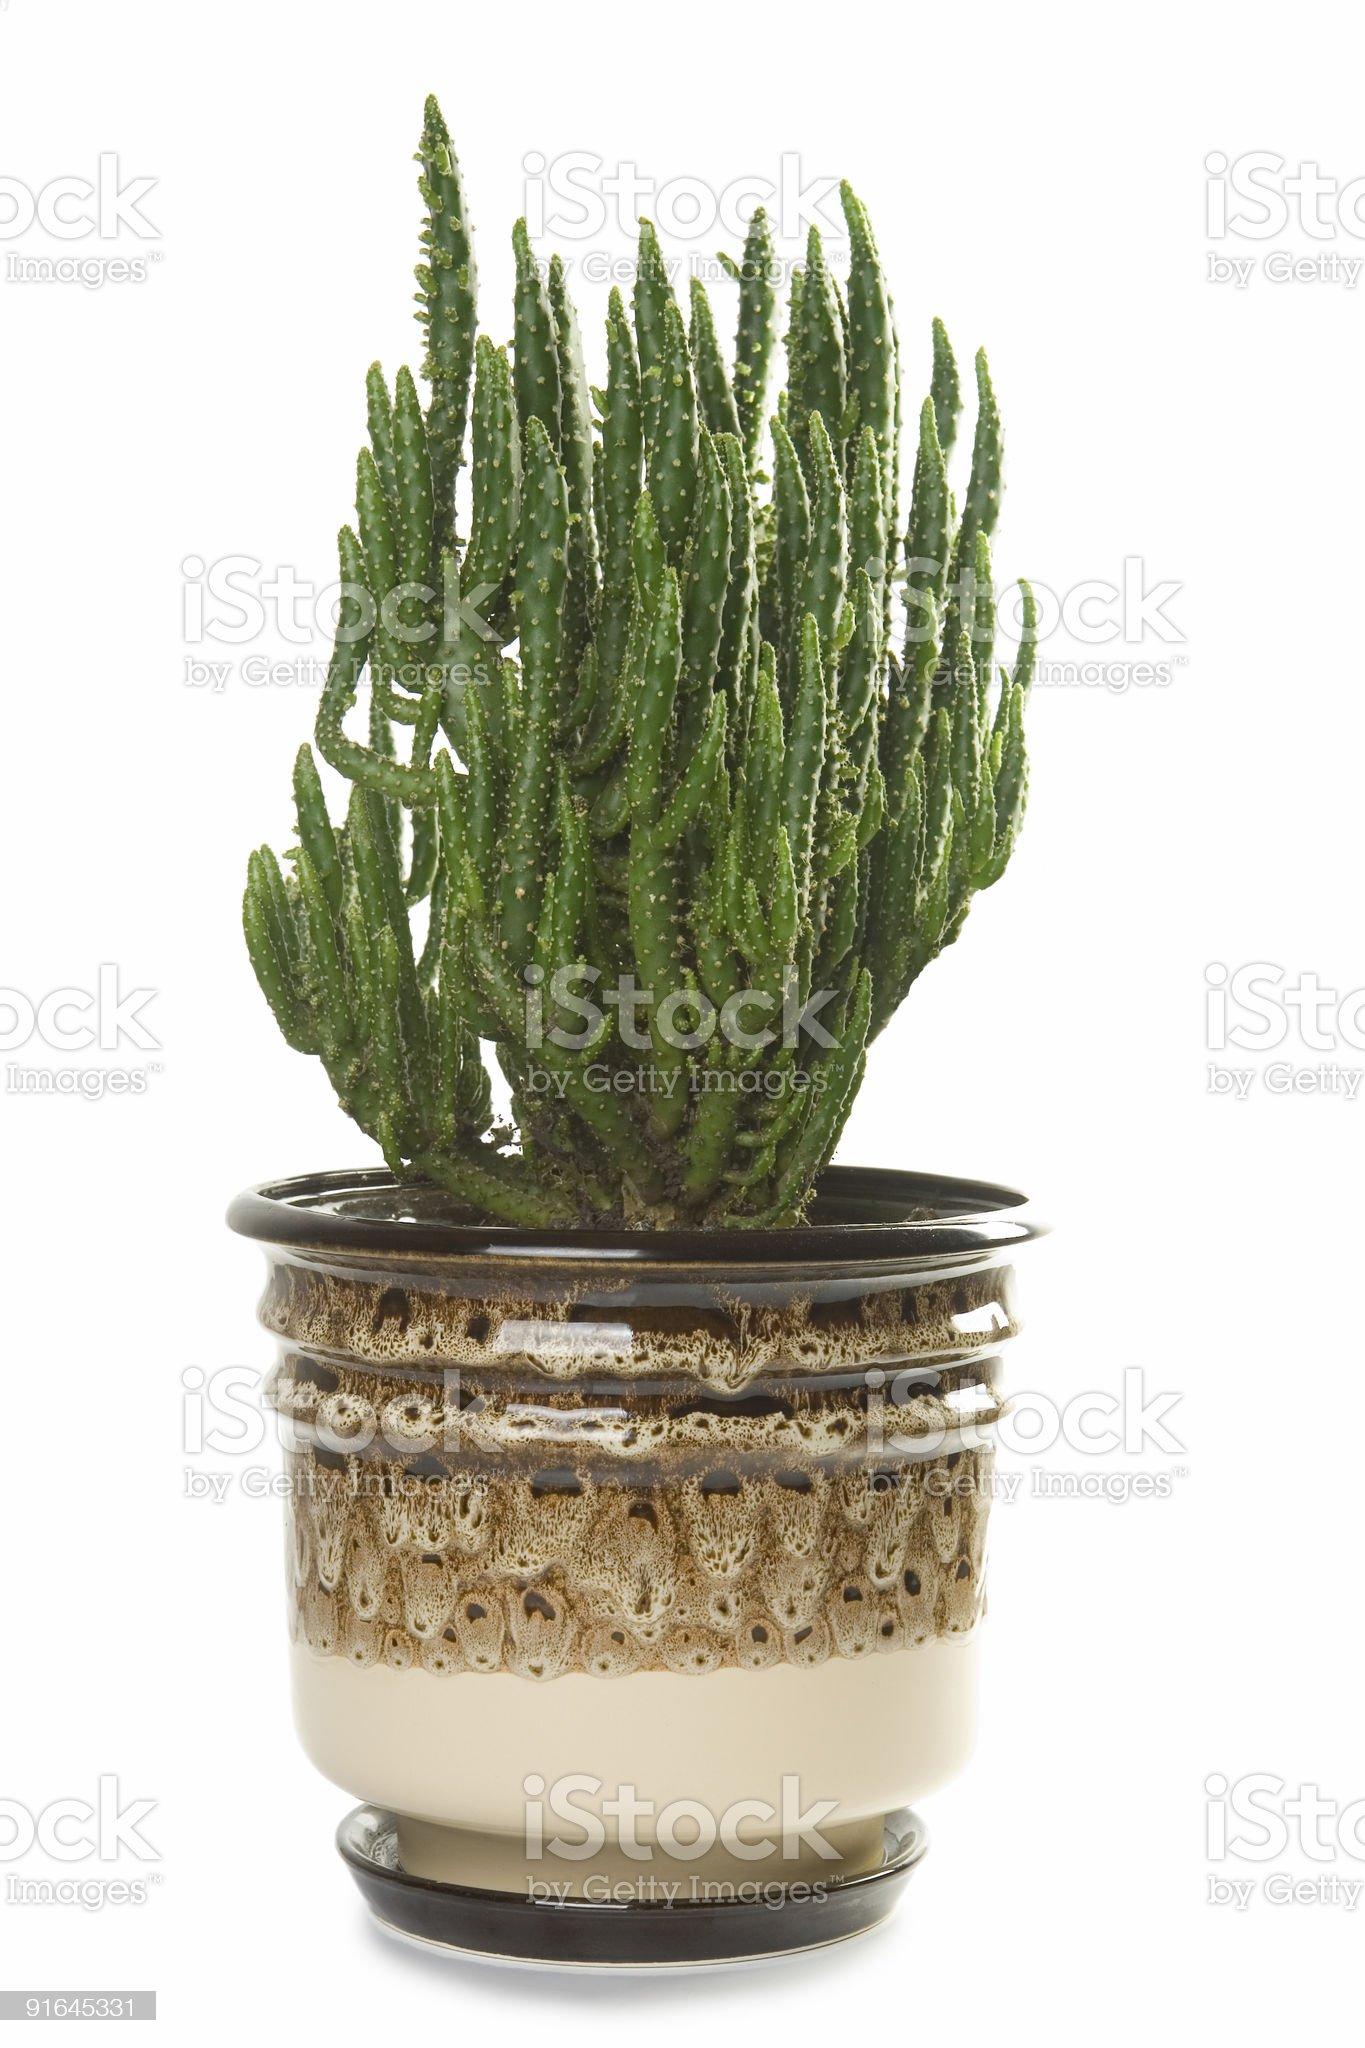 Big cactus in flowerpot royalty-free stock photo